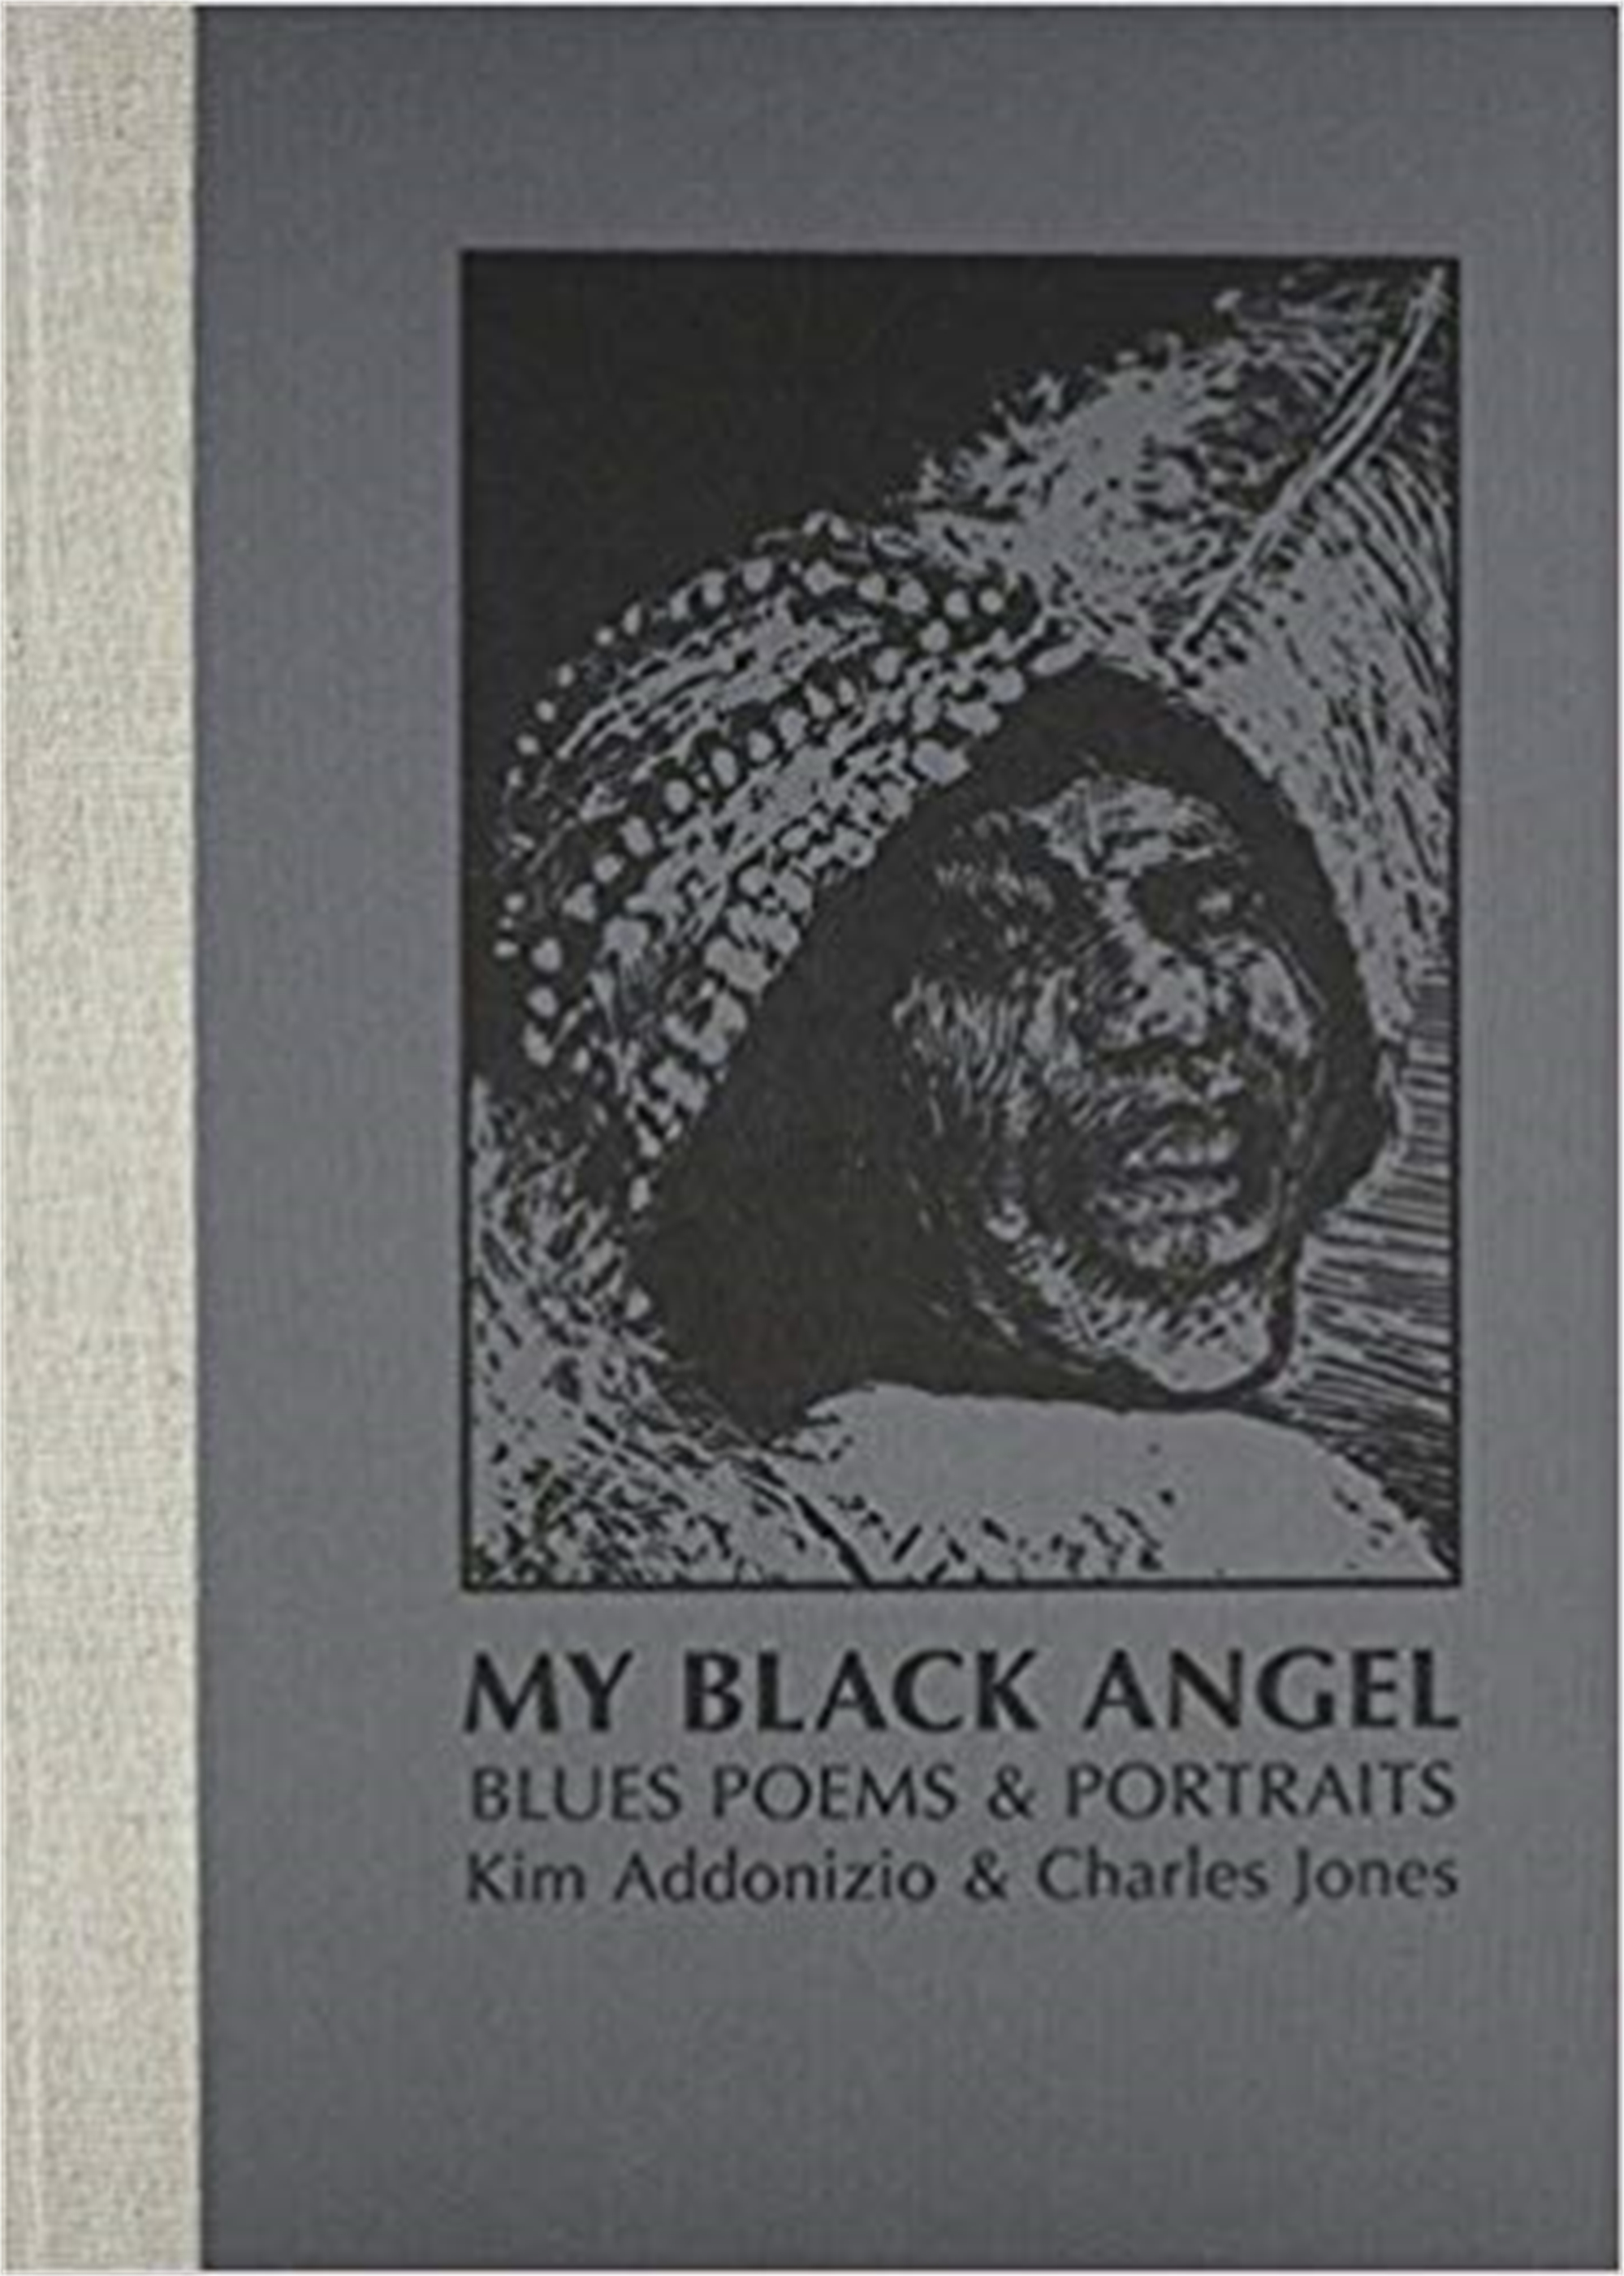 My Black Angel, Blues Poems & Portraits by Charles Jones